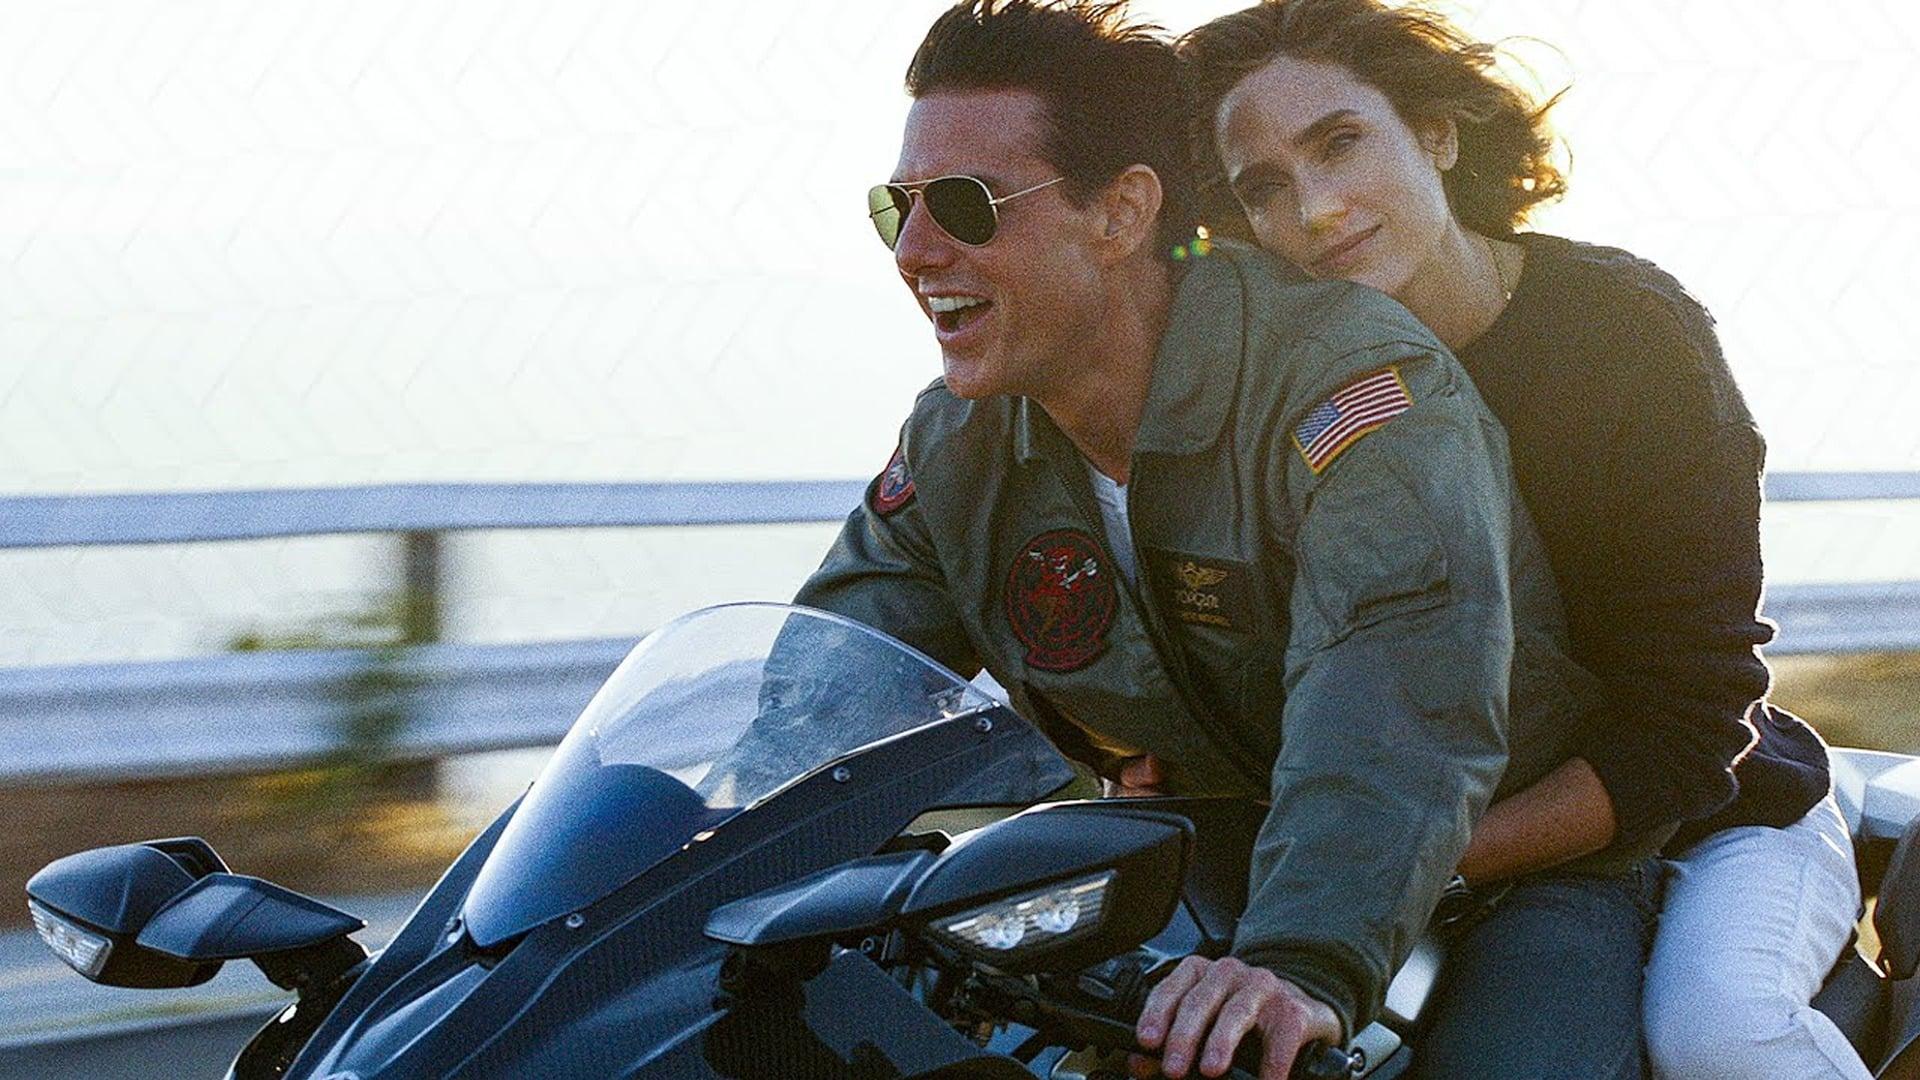 Tom Cruise Top Gun: Maverick